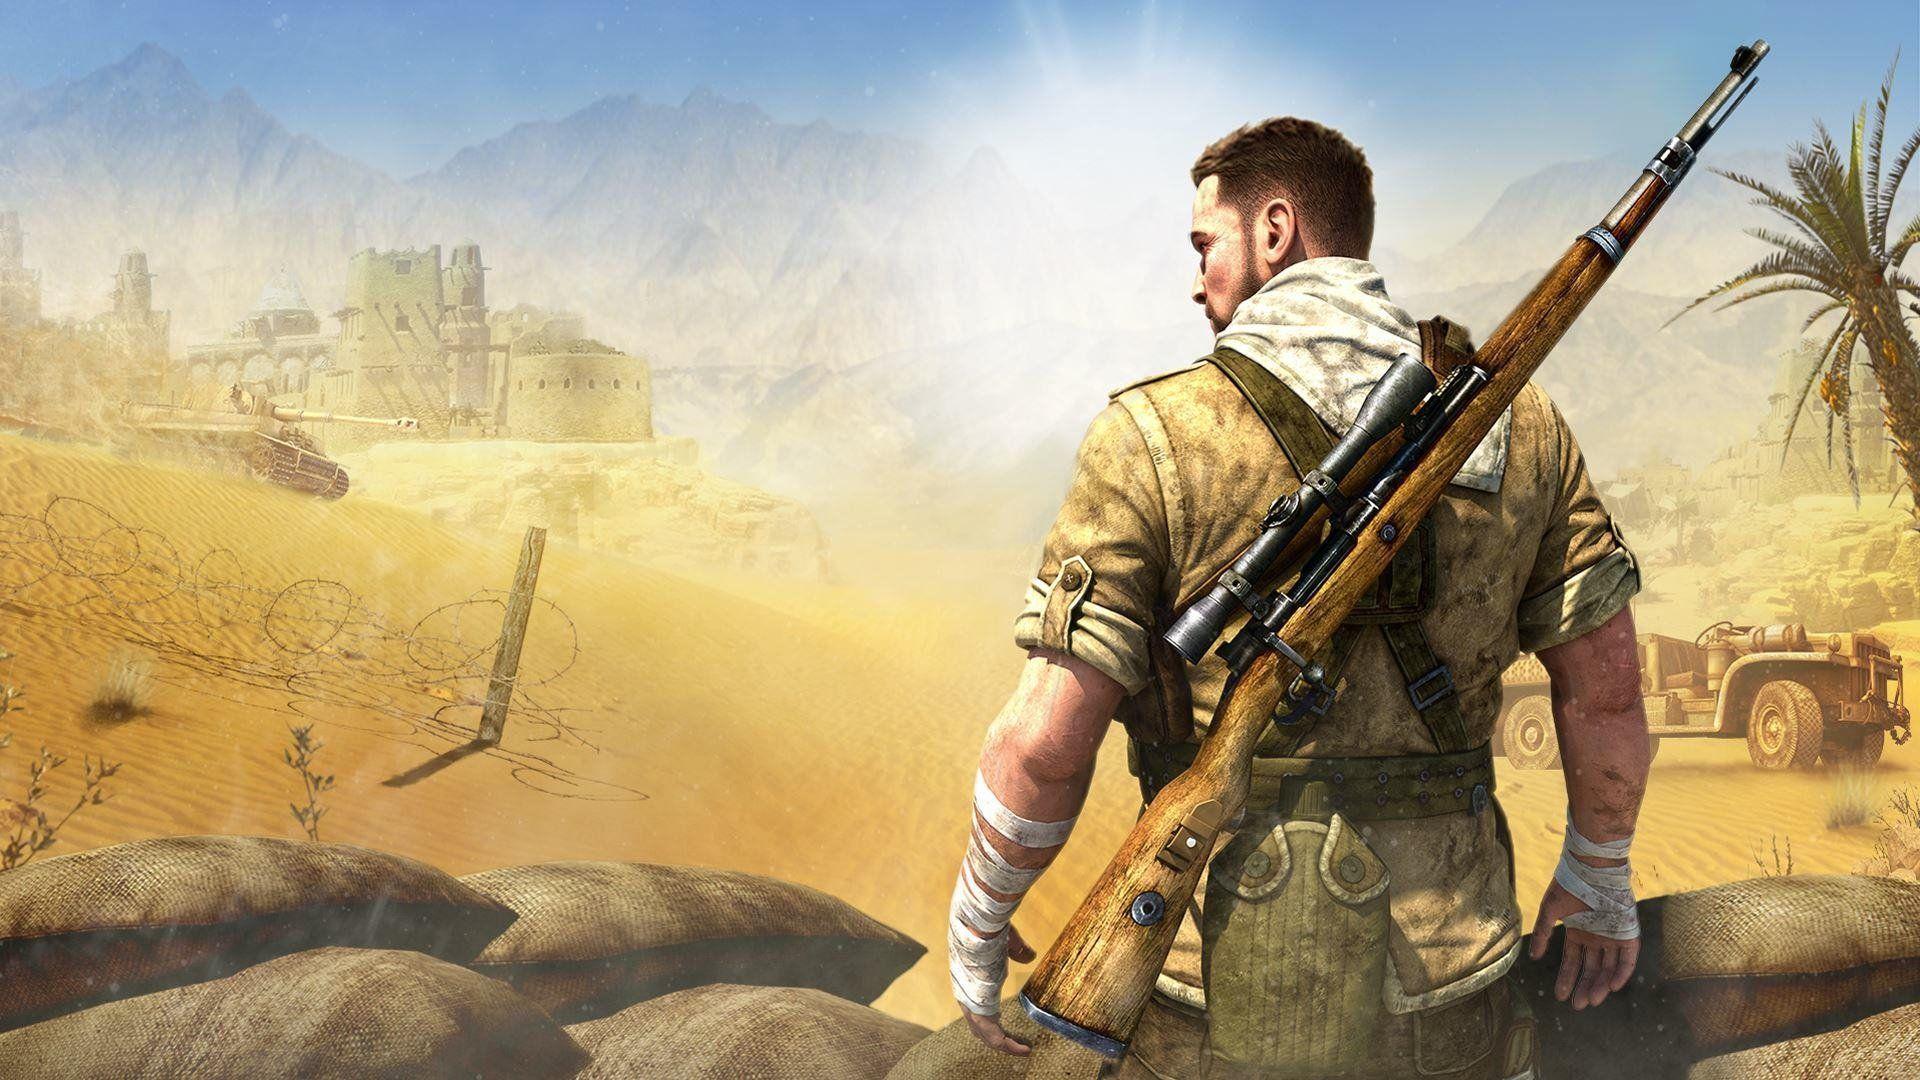 Pubg Sniper Wallpaper: Sniper Elite Wallpapers